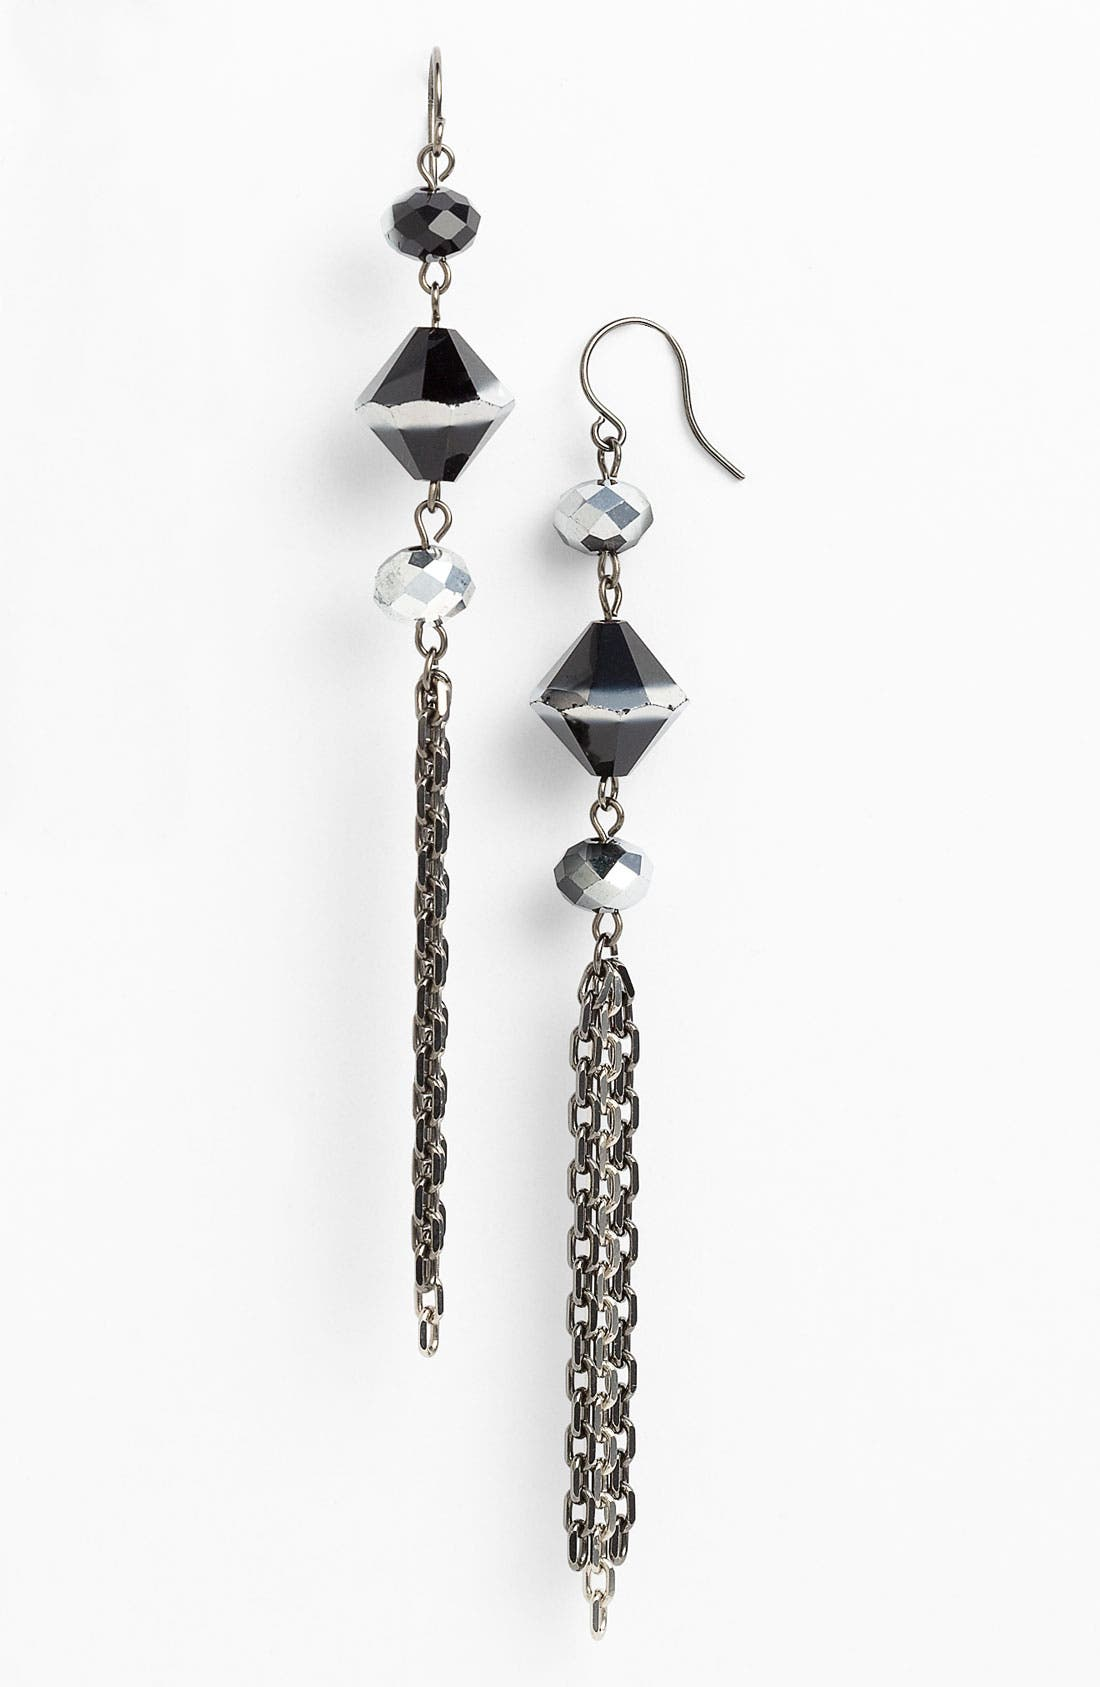 Main Image - Nordstrom 'Wisteria' Linear Earrings